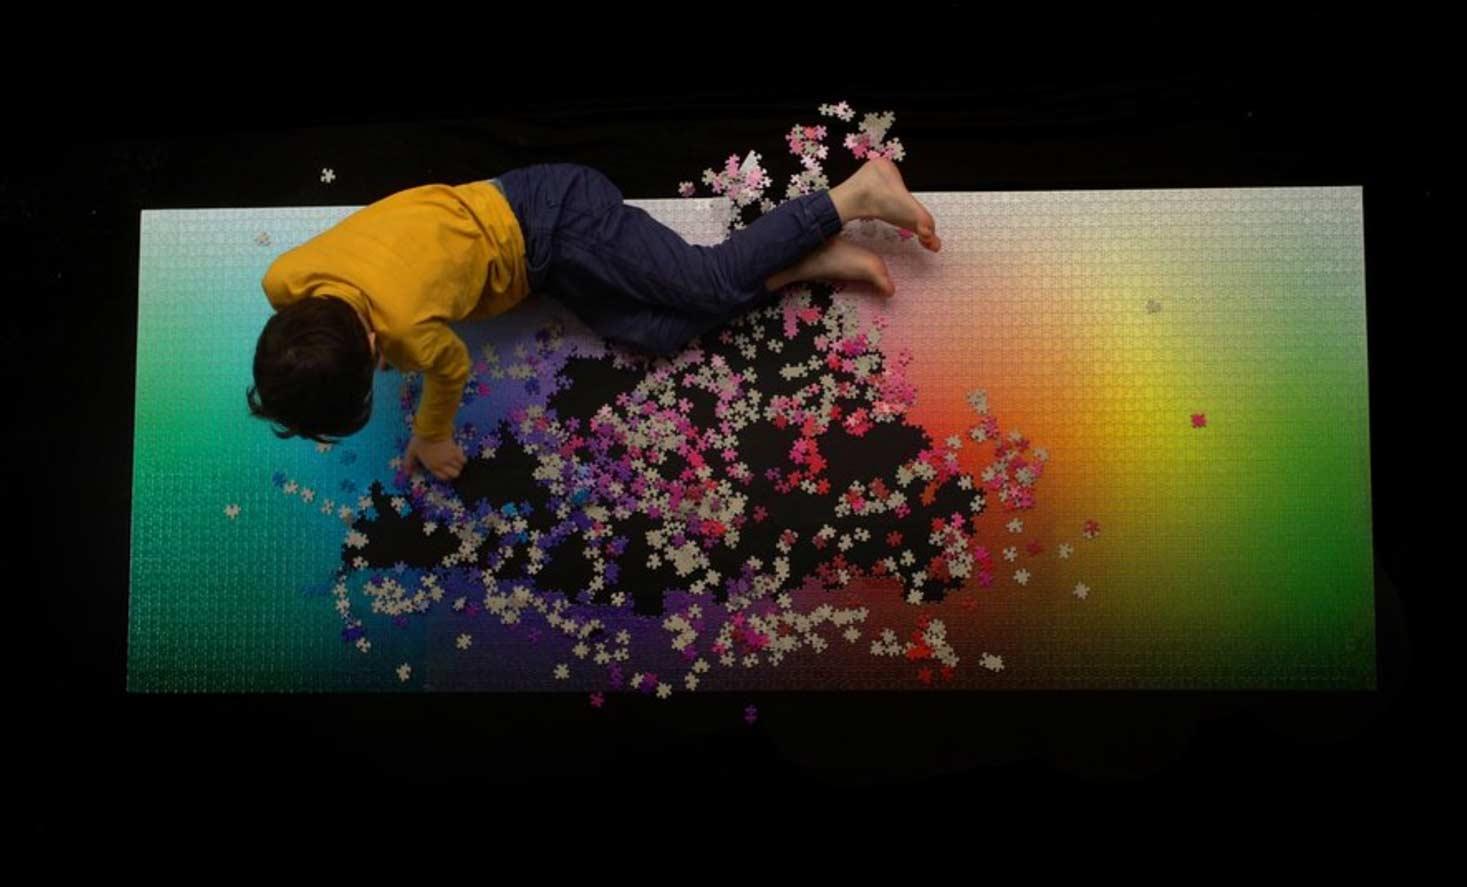 Farbverlauf-Puzzle mit 5.000 Teilen 5000-colors-puzzle_03